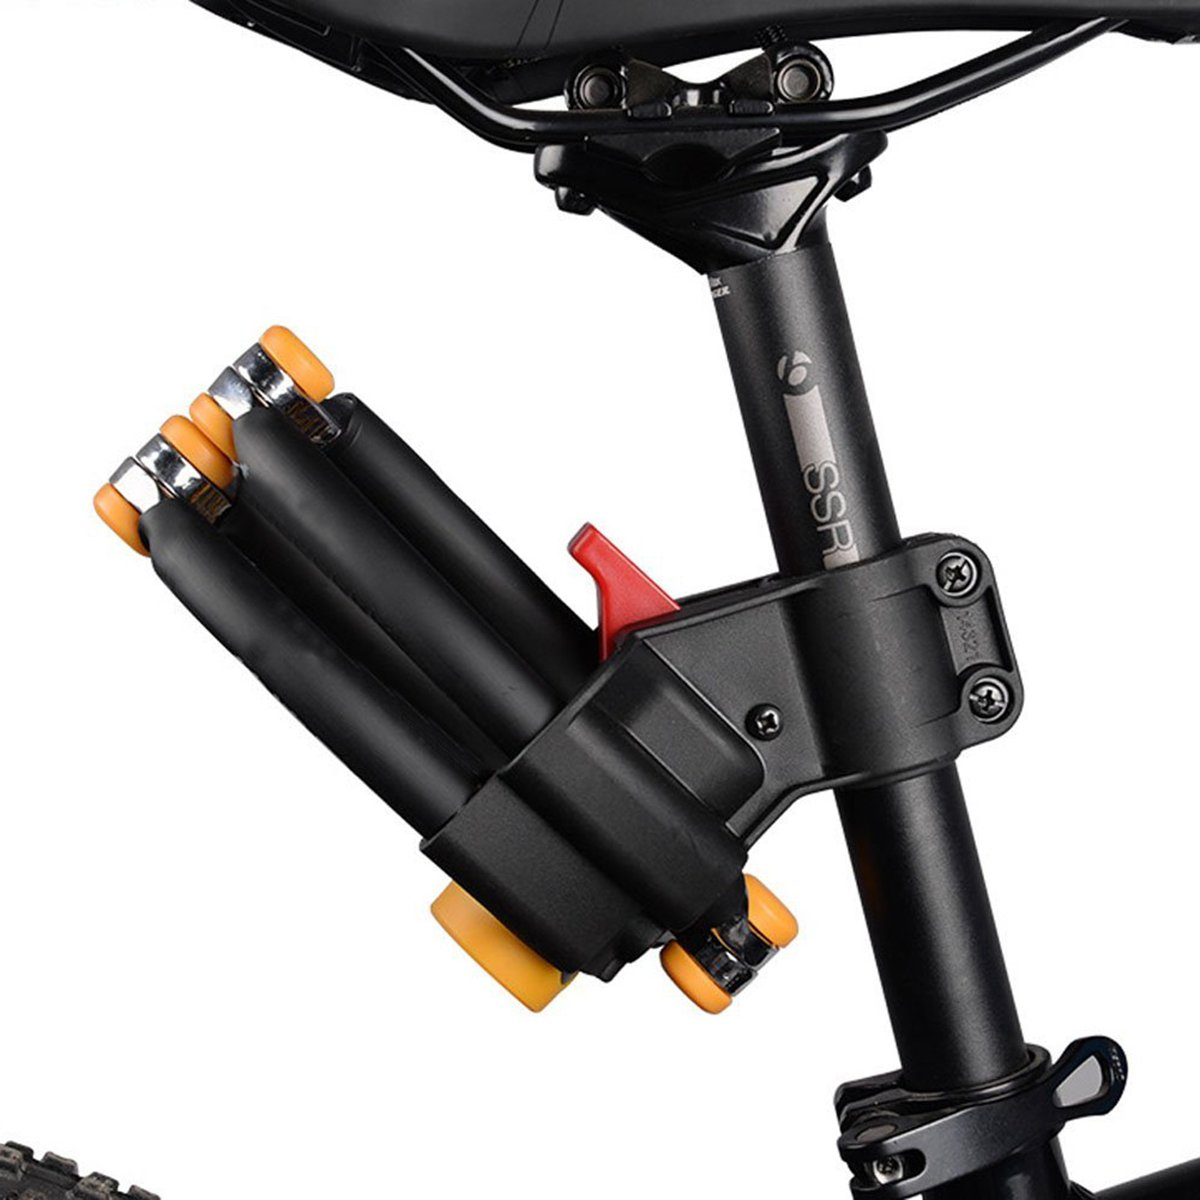 AKM Bike Lock, 4 Joints Alloy Steel Folding Bike Lock Anti-hydraulic with Complimentary Mounting Bracket